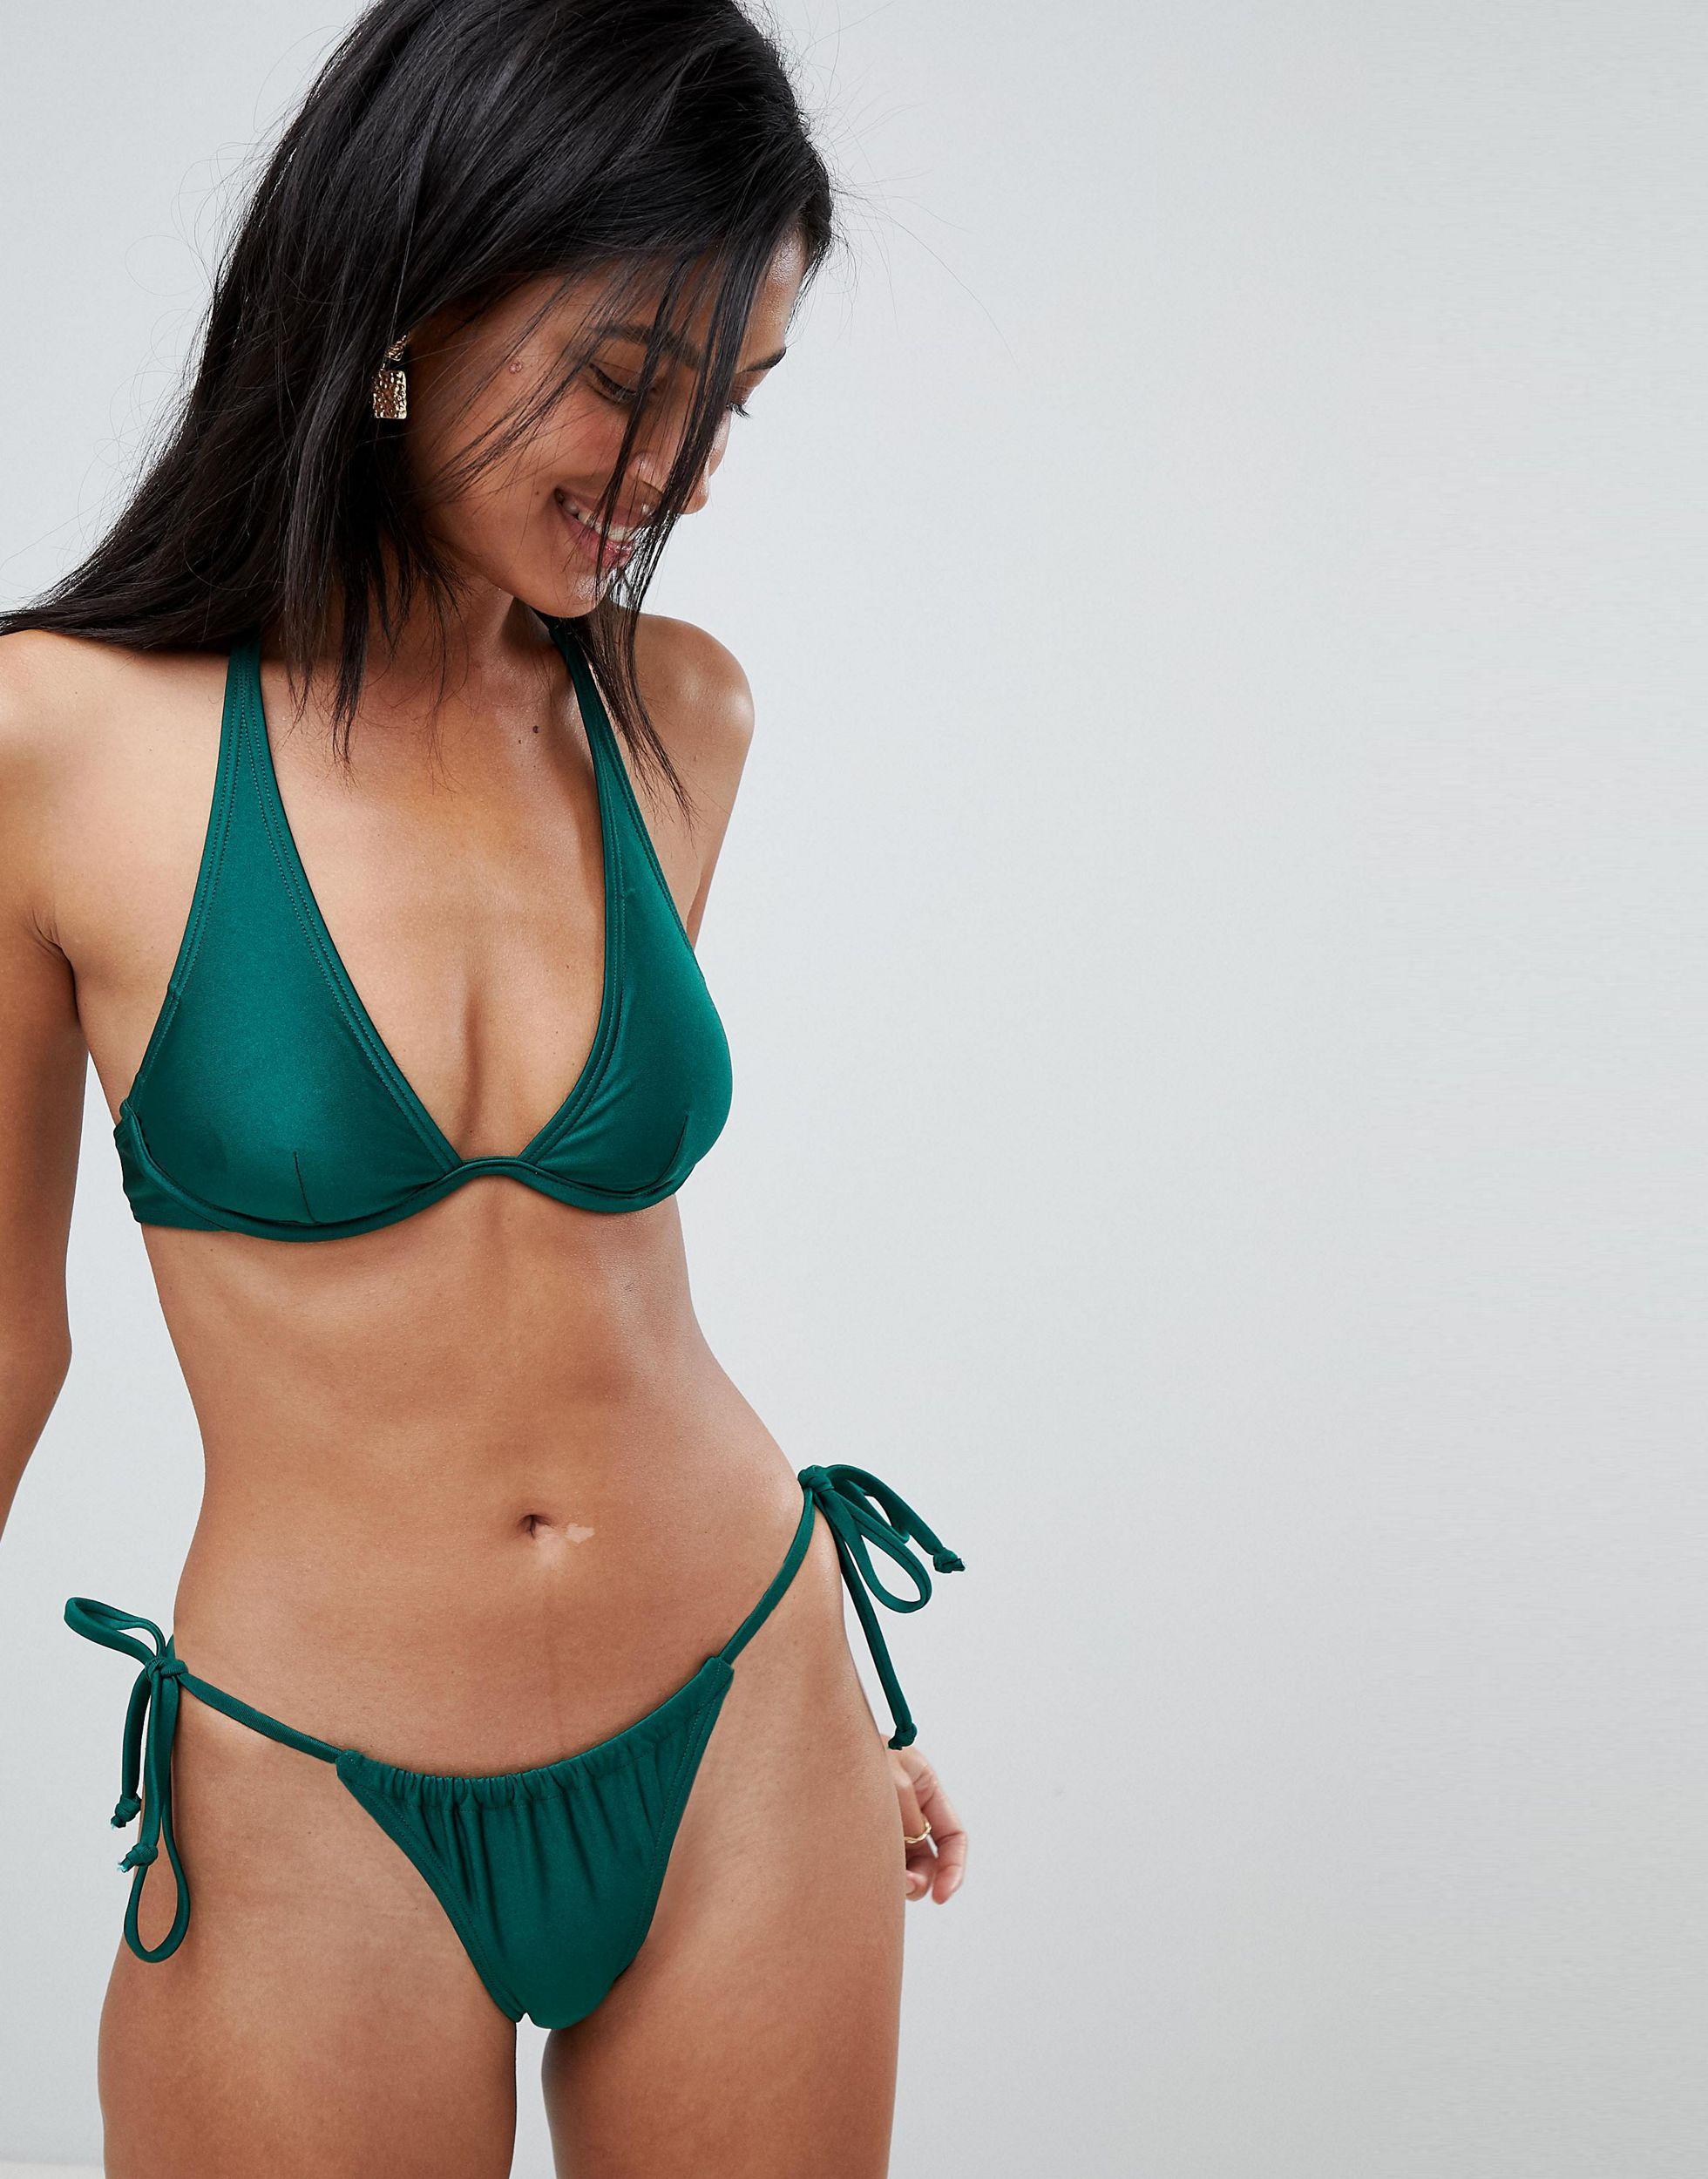 Celebrities Bikini Bodies